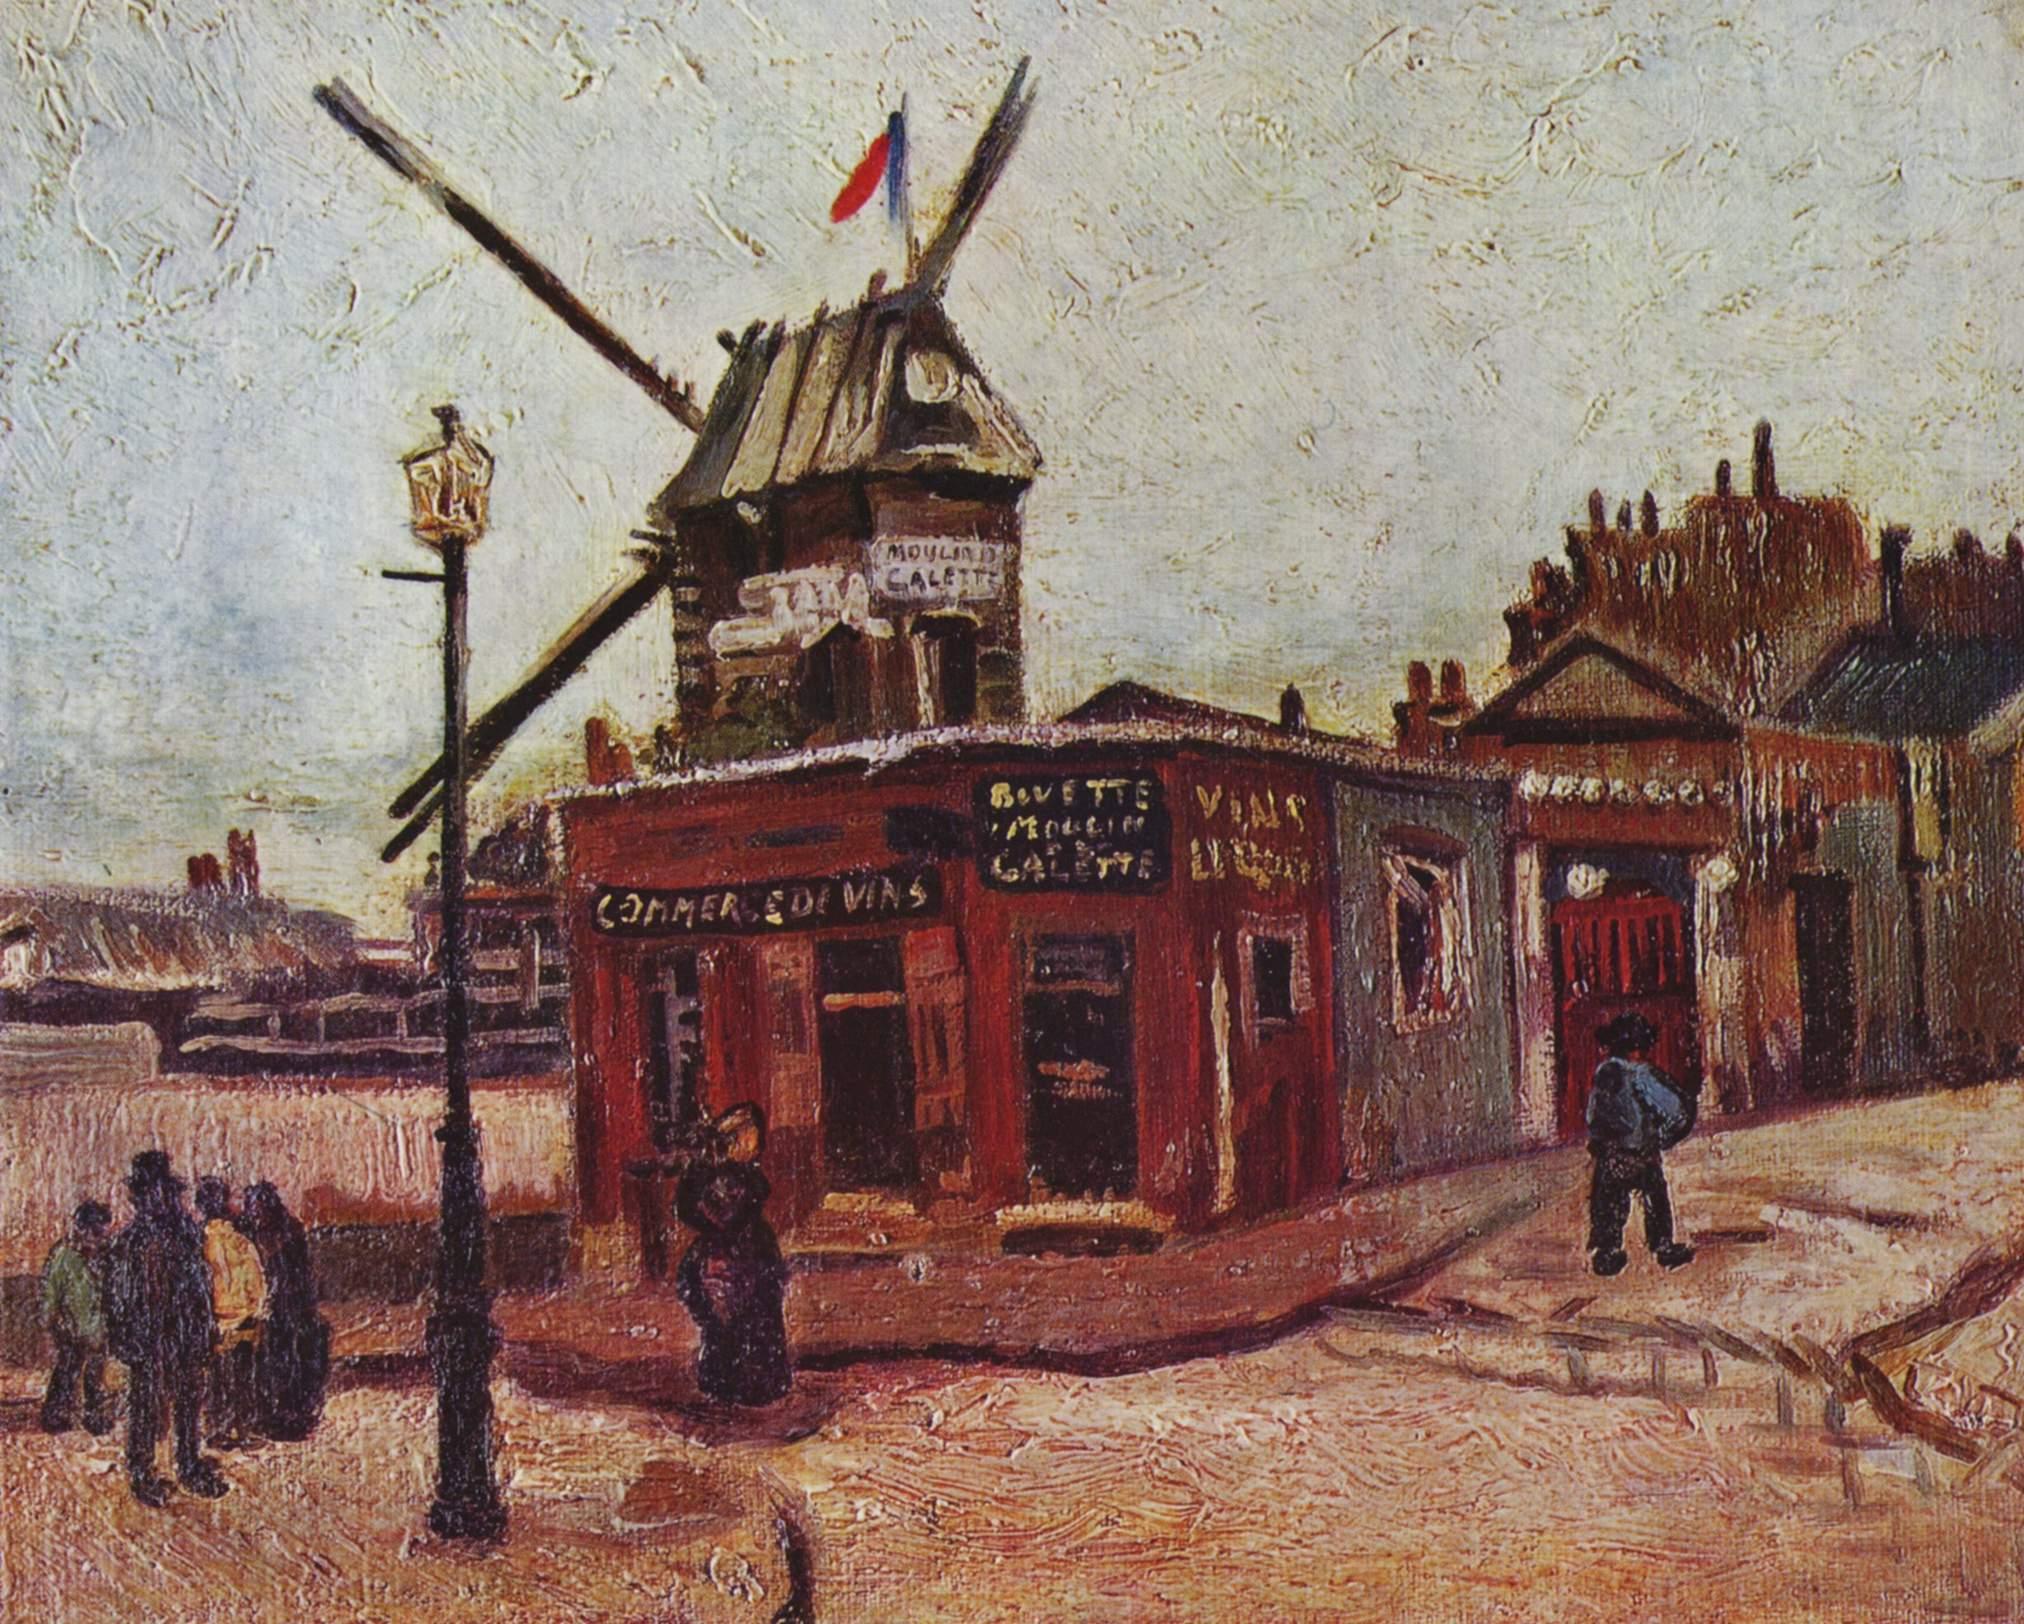 Vincent_Willem_van_Gogh_066.jpg